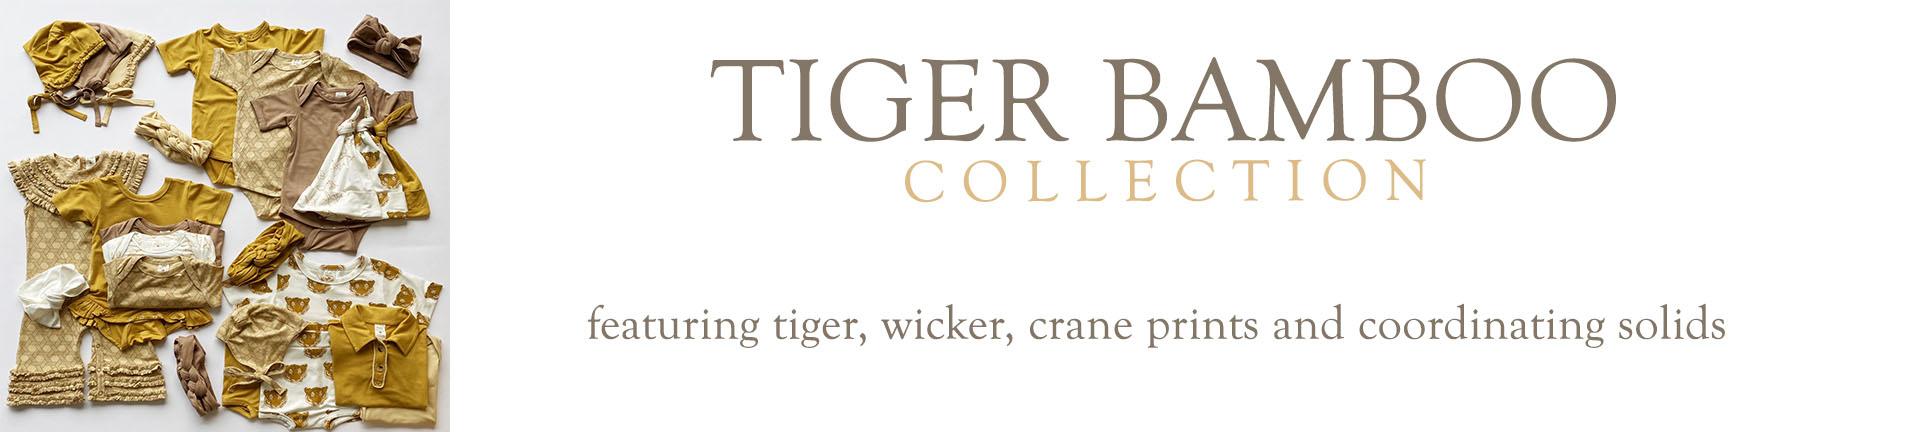 0-tiger-banner3.jpg